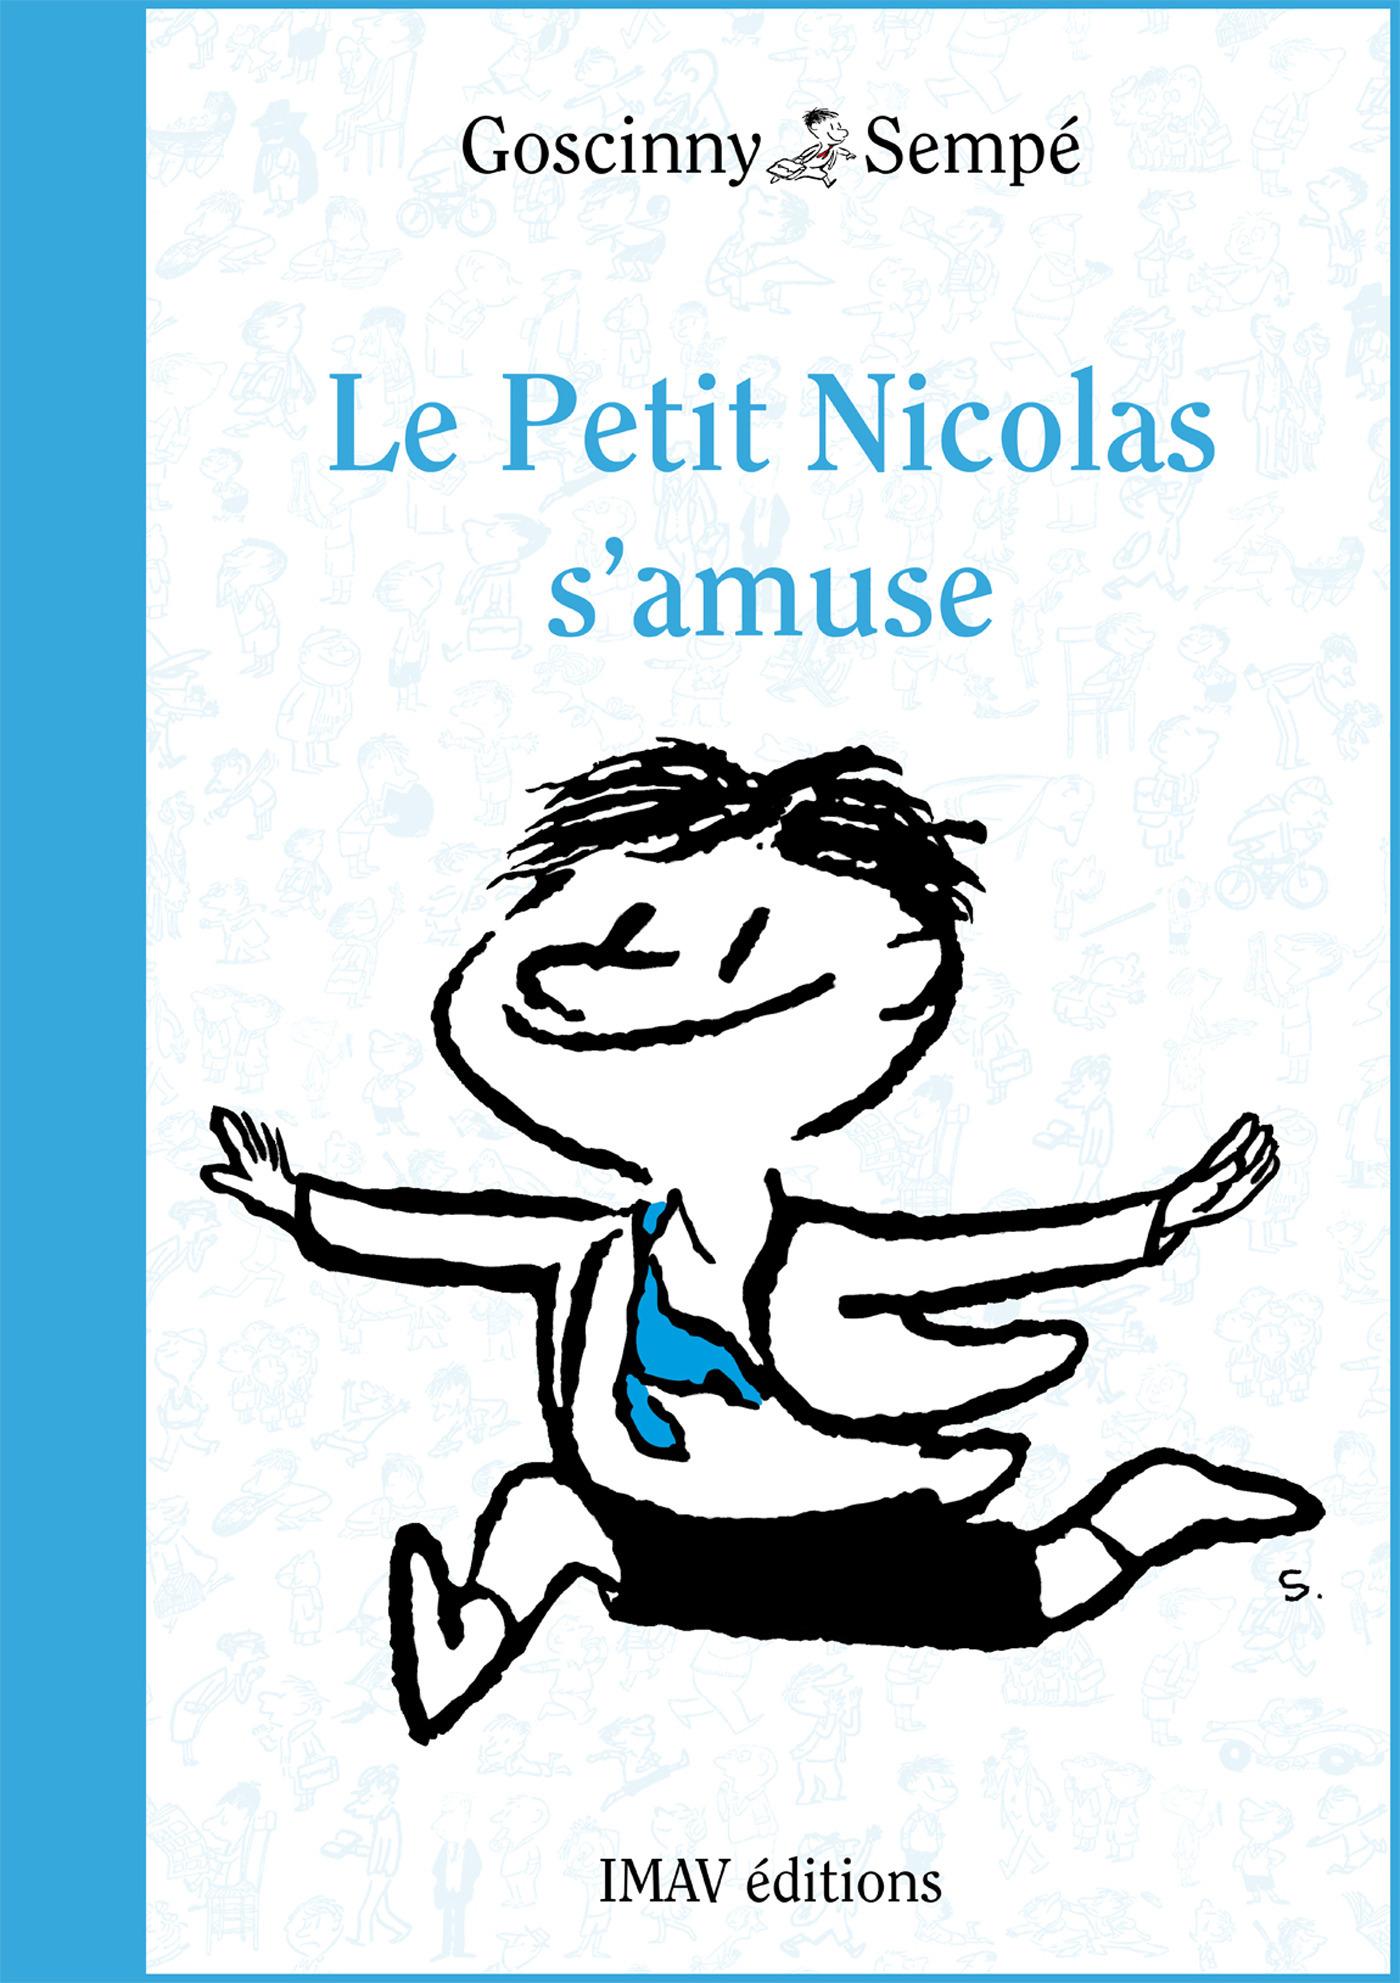 Le Petit Nicolas s'amuse